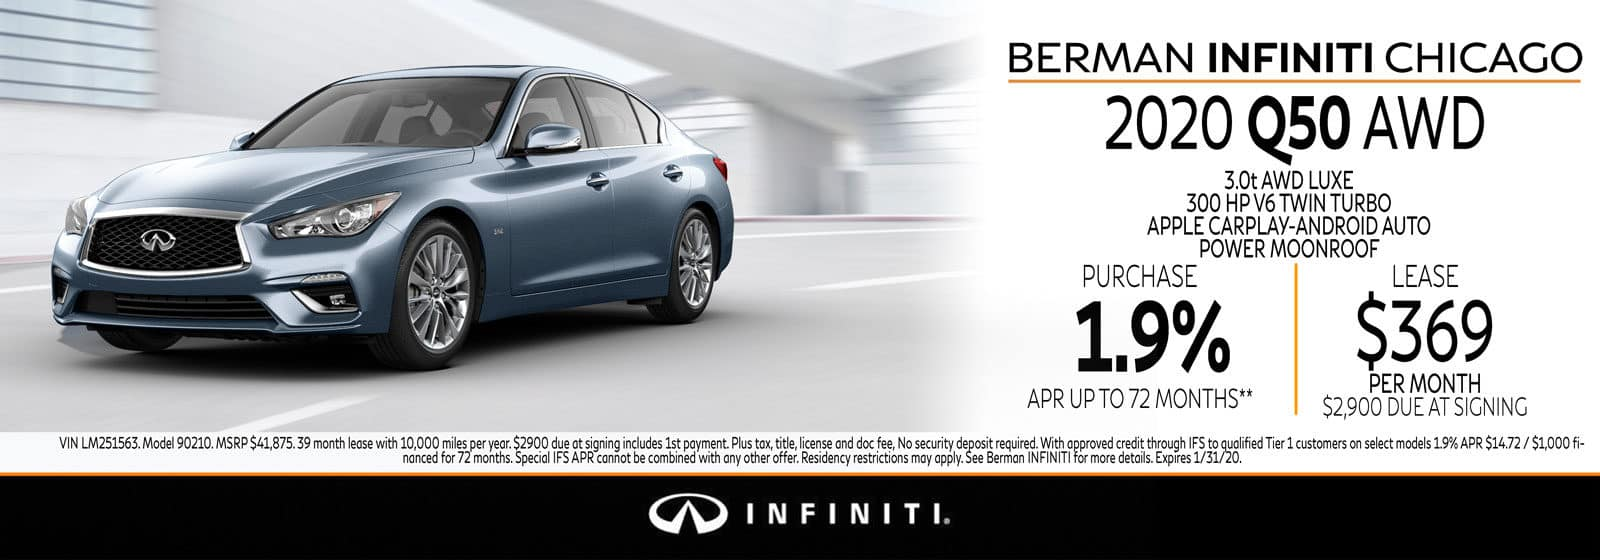 New 2020 INFINITI Q50 January offer at Berman INFINITI Chicago!